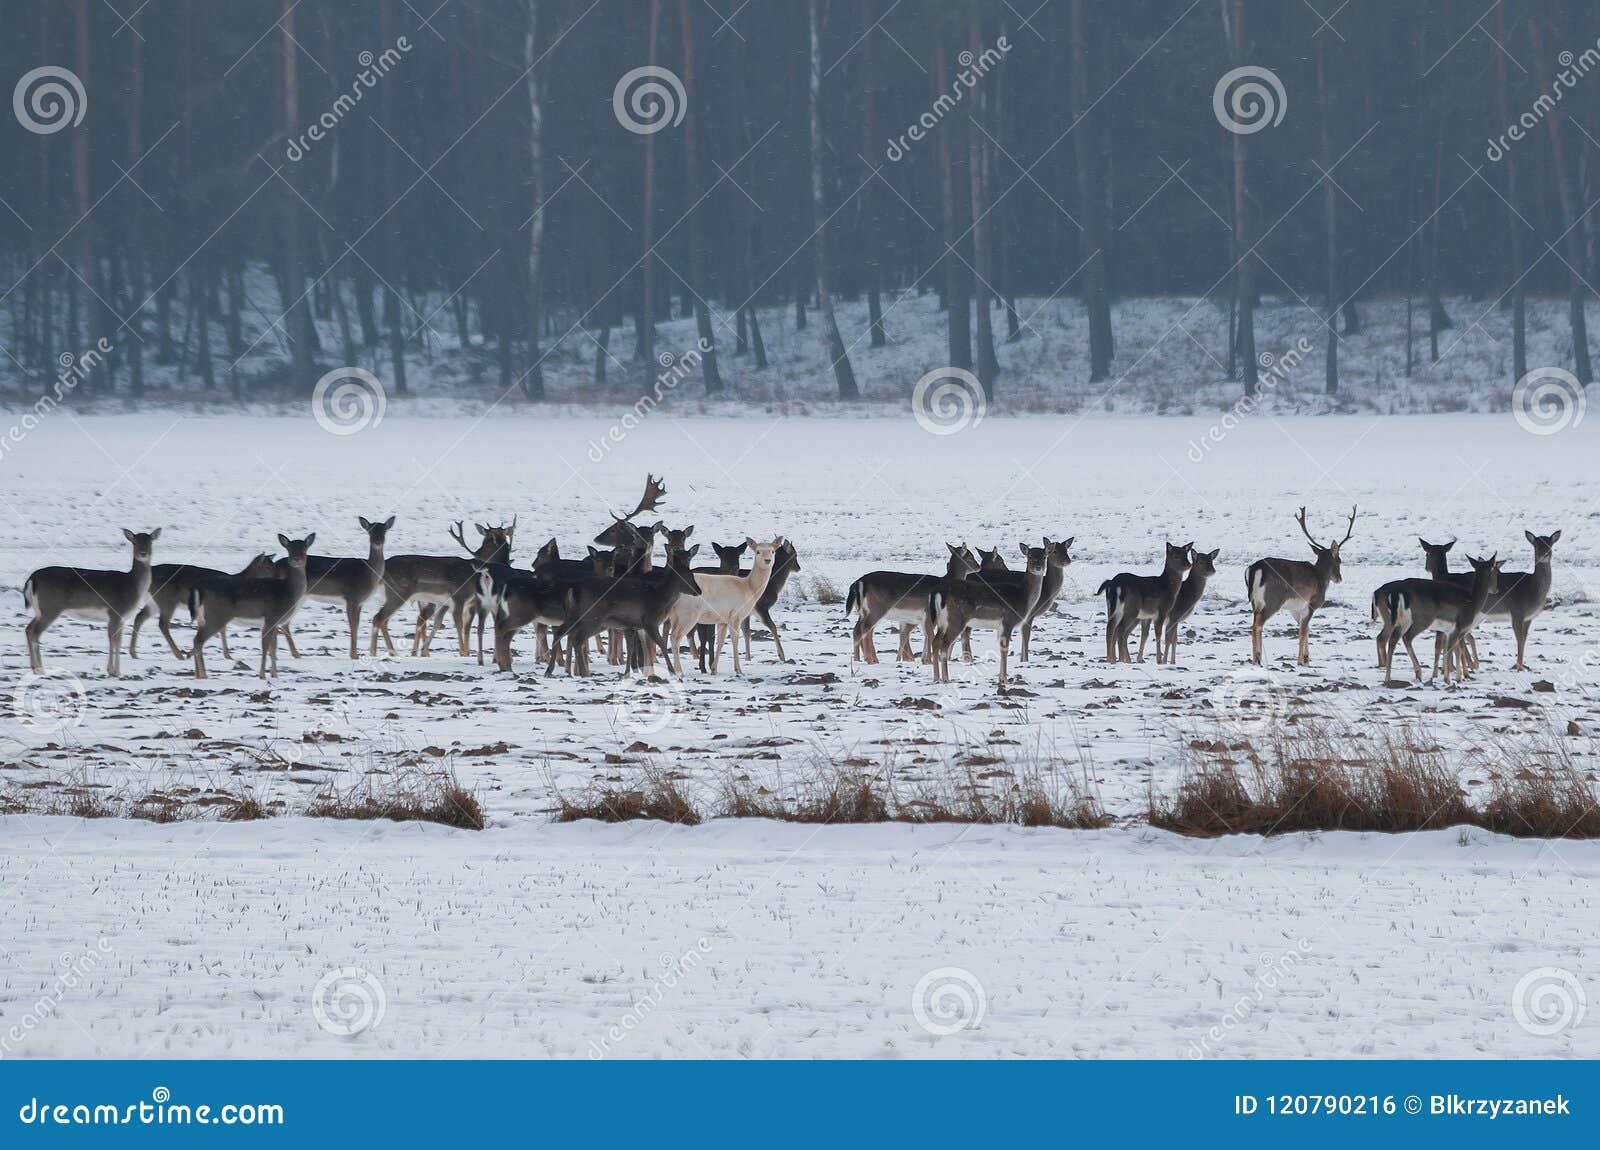 An albino fallow deer in a herd on snow